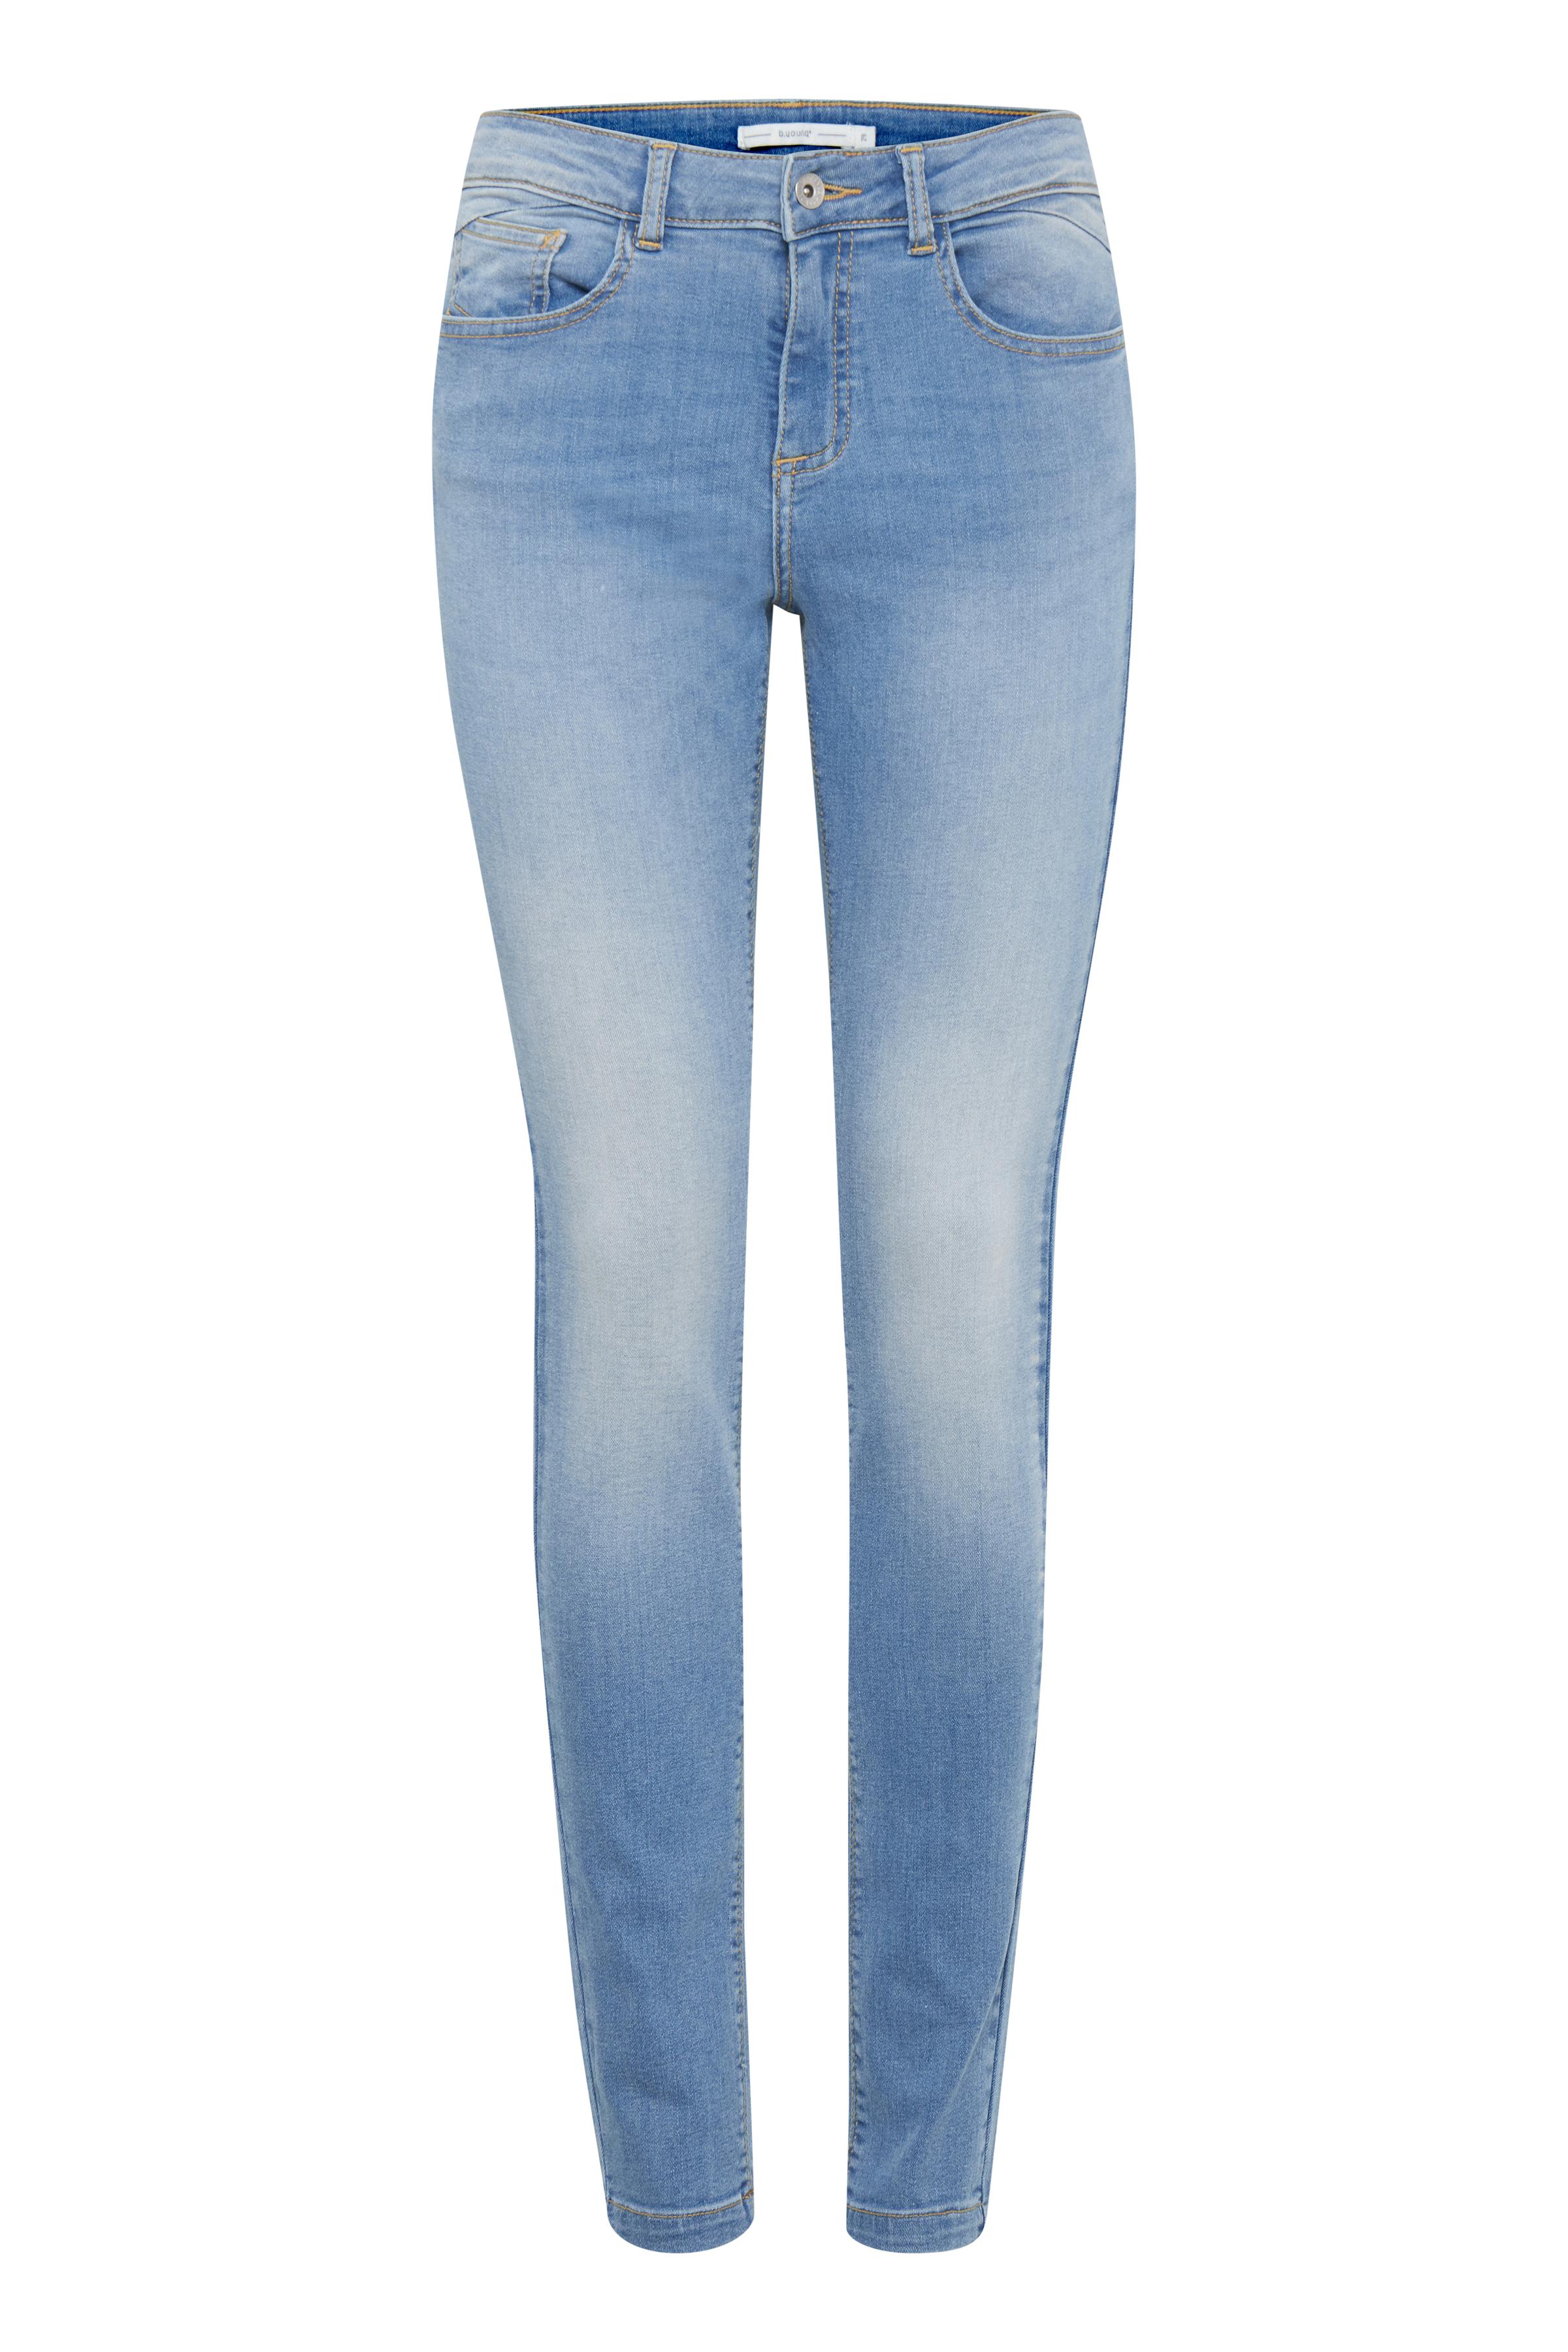 Light blue Lola luni Jeans van b.young – Koop Light blue Lola luni Jeans hier van size 25-36